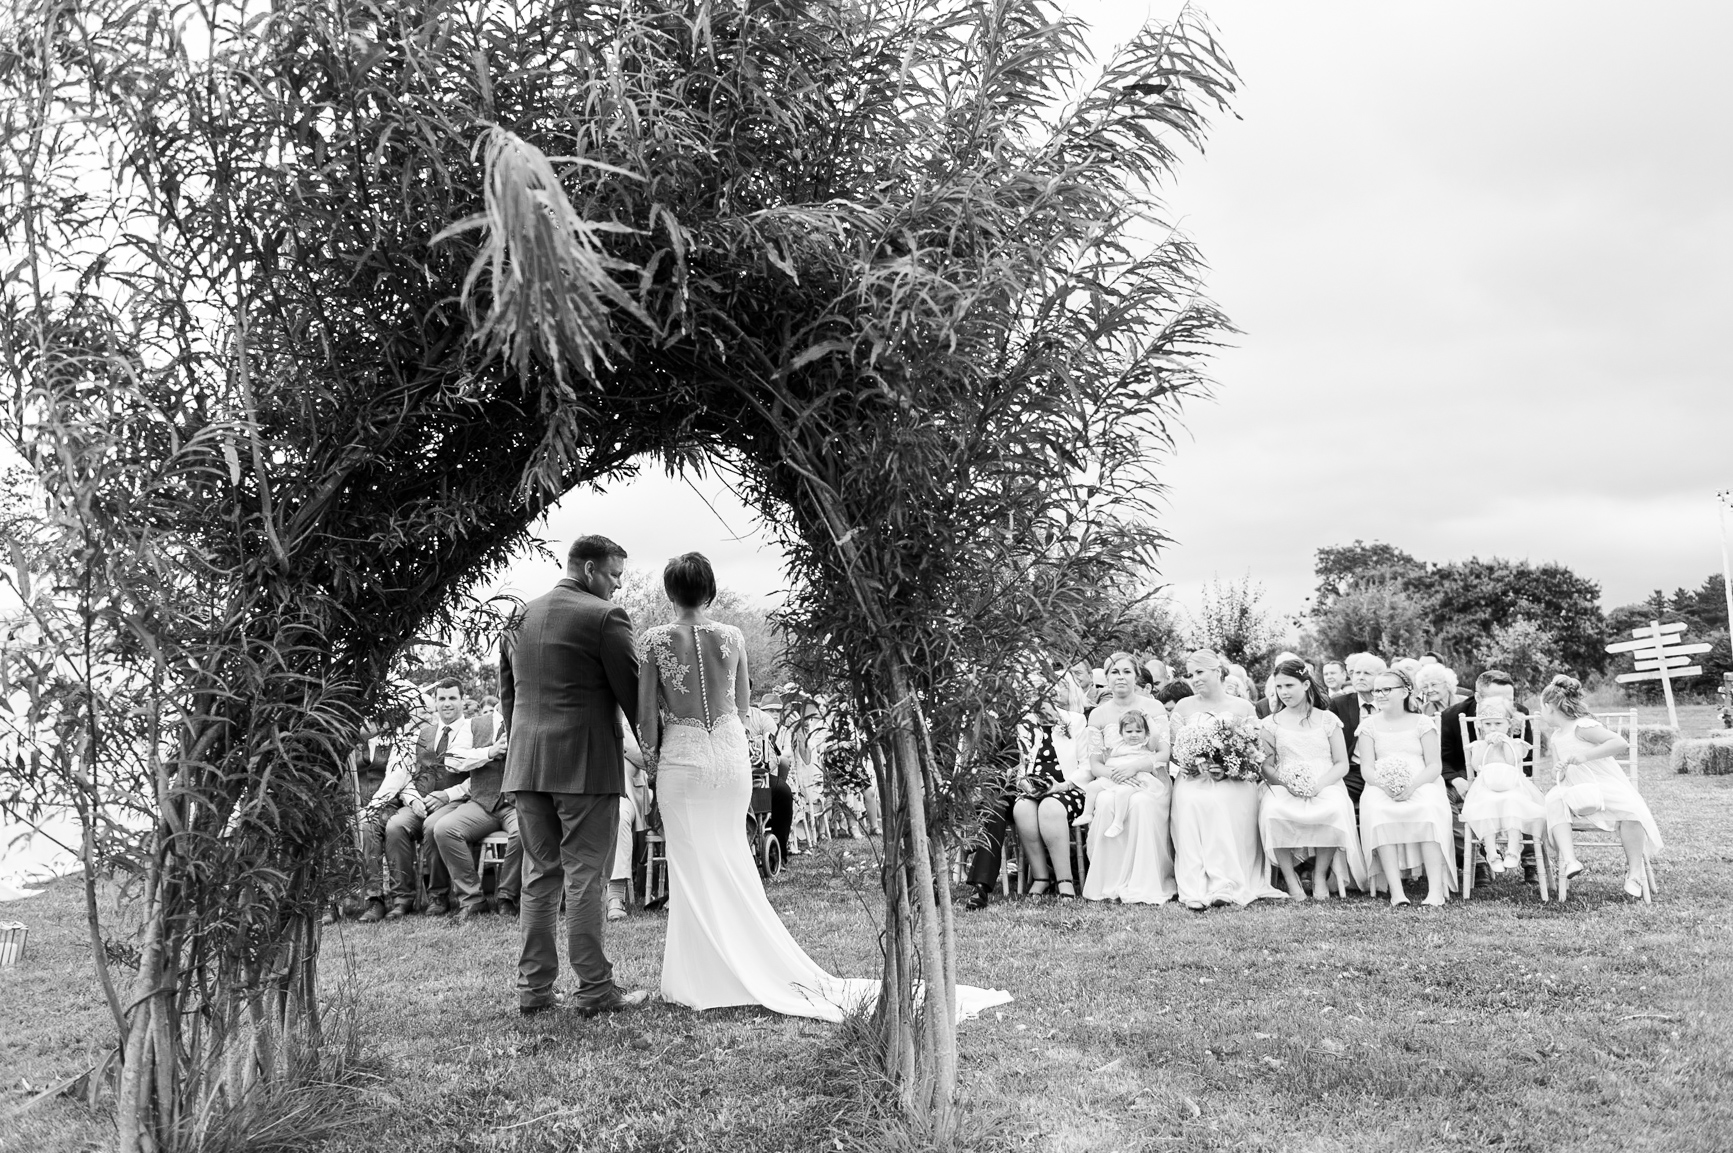 Reverse view of the wedding ceremony